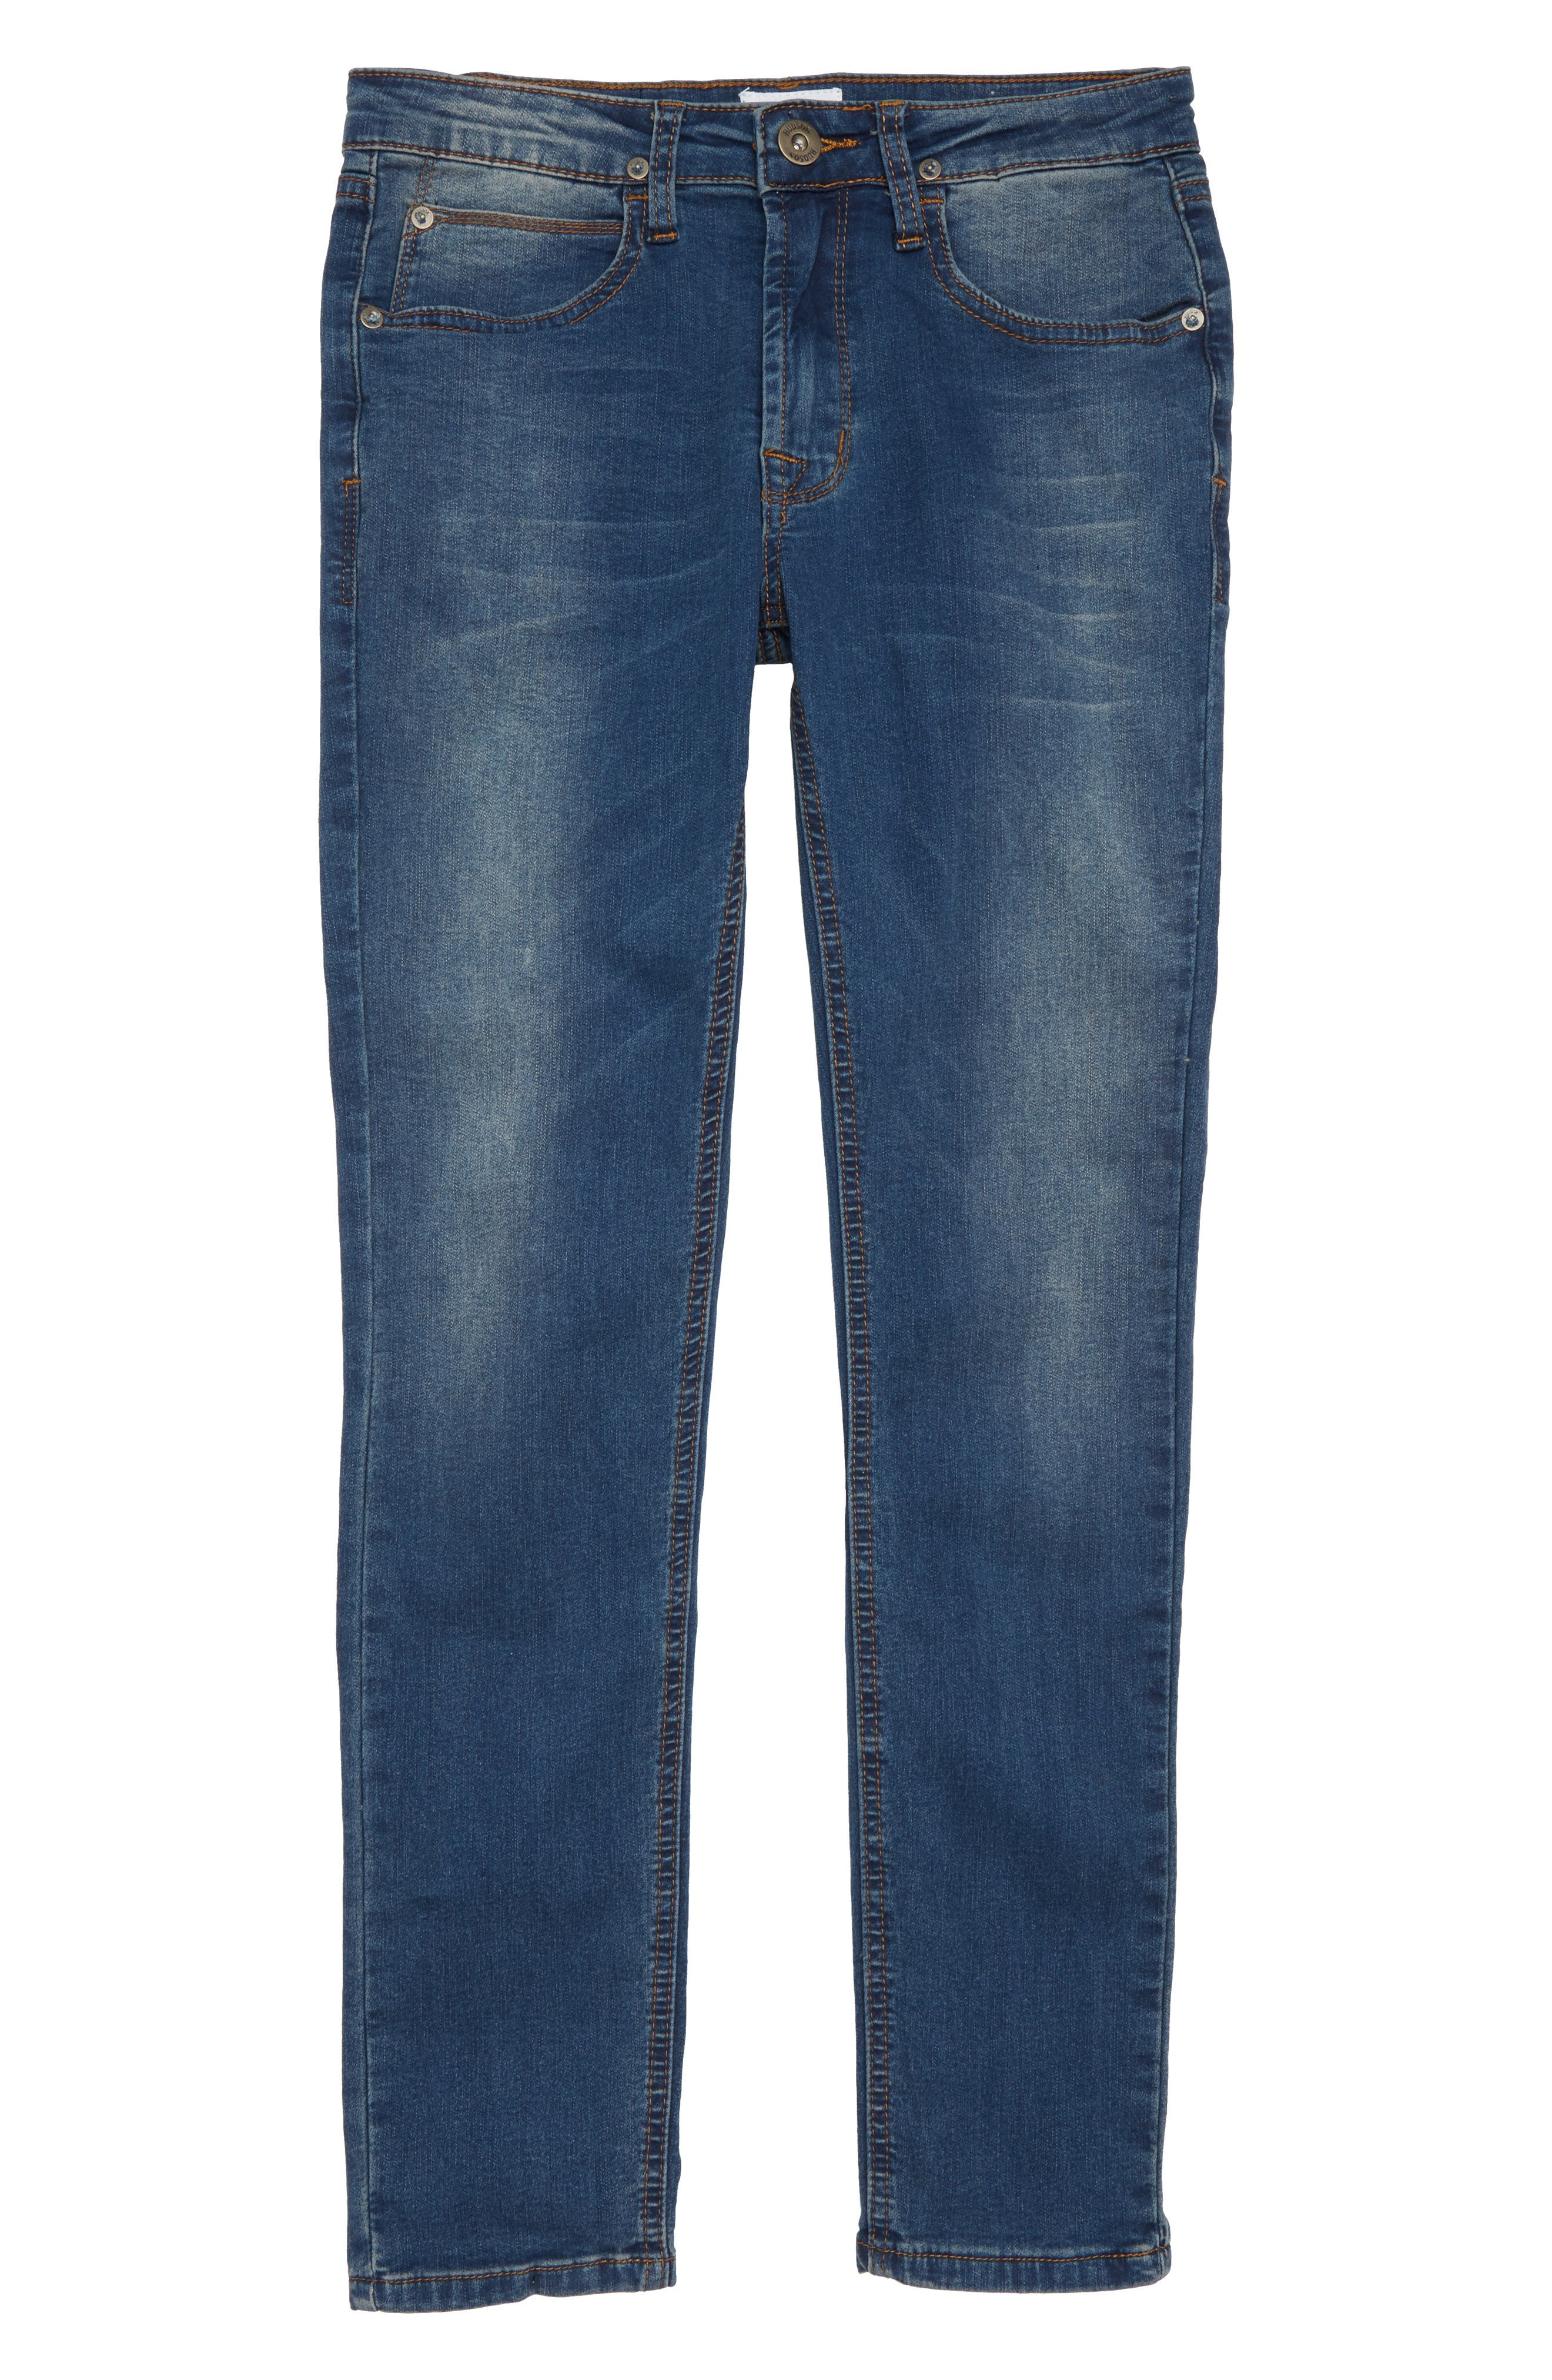 Jagger Slim Fit Straight Leg Jeans,                         Main,                         color, 458